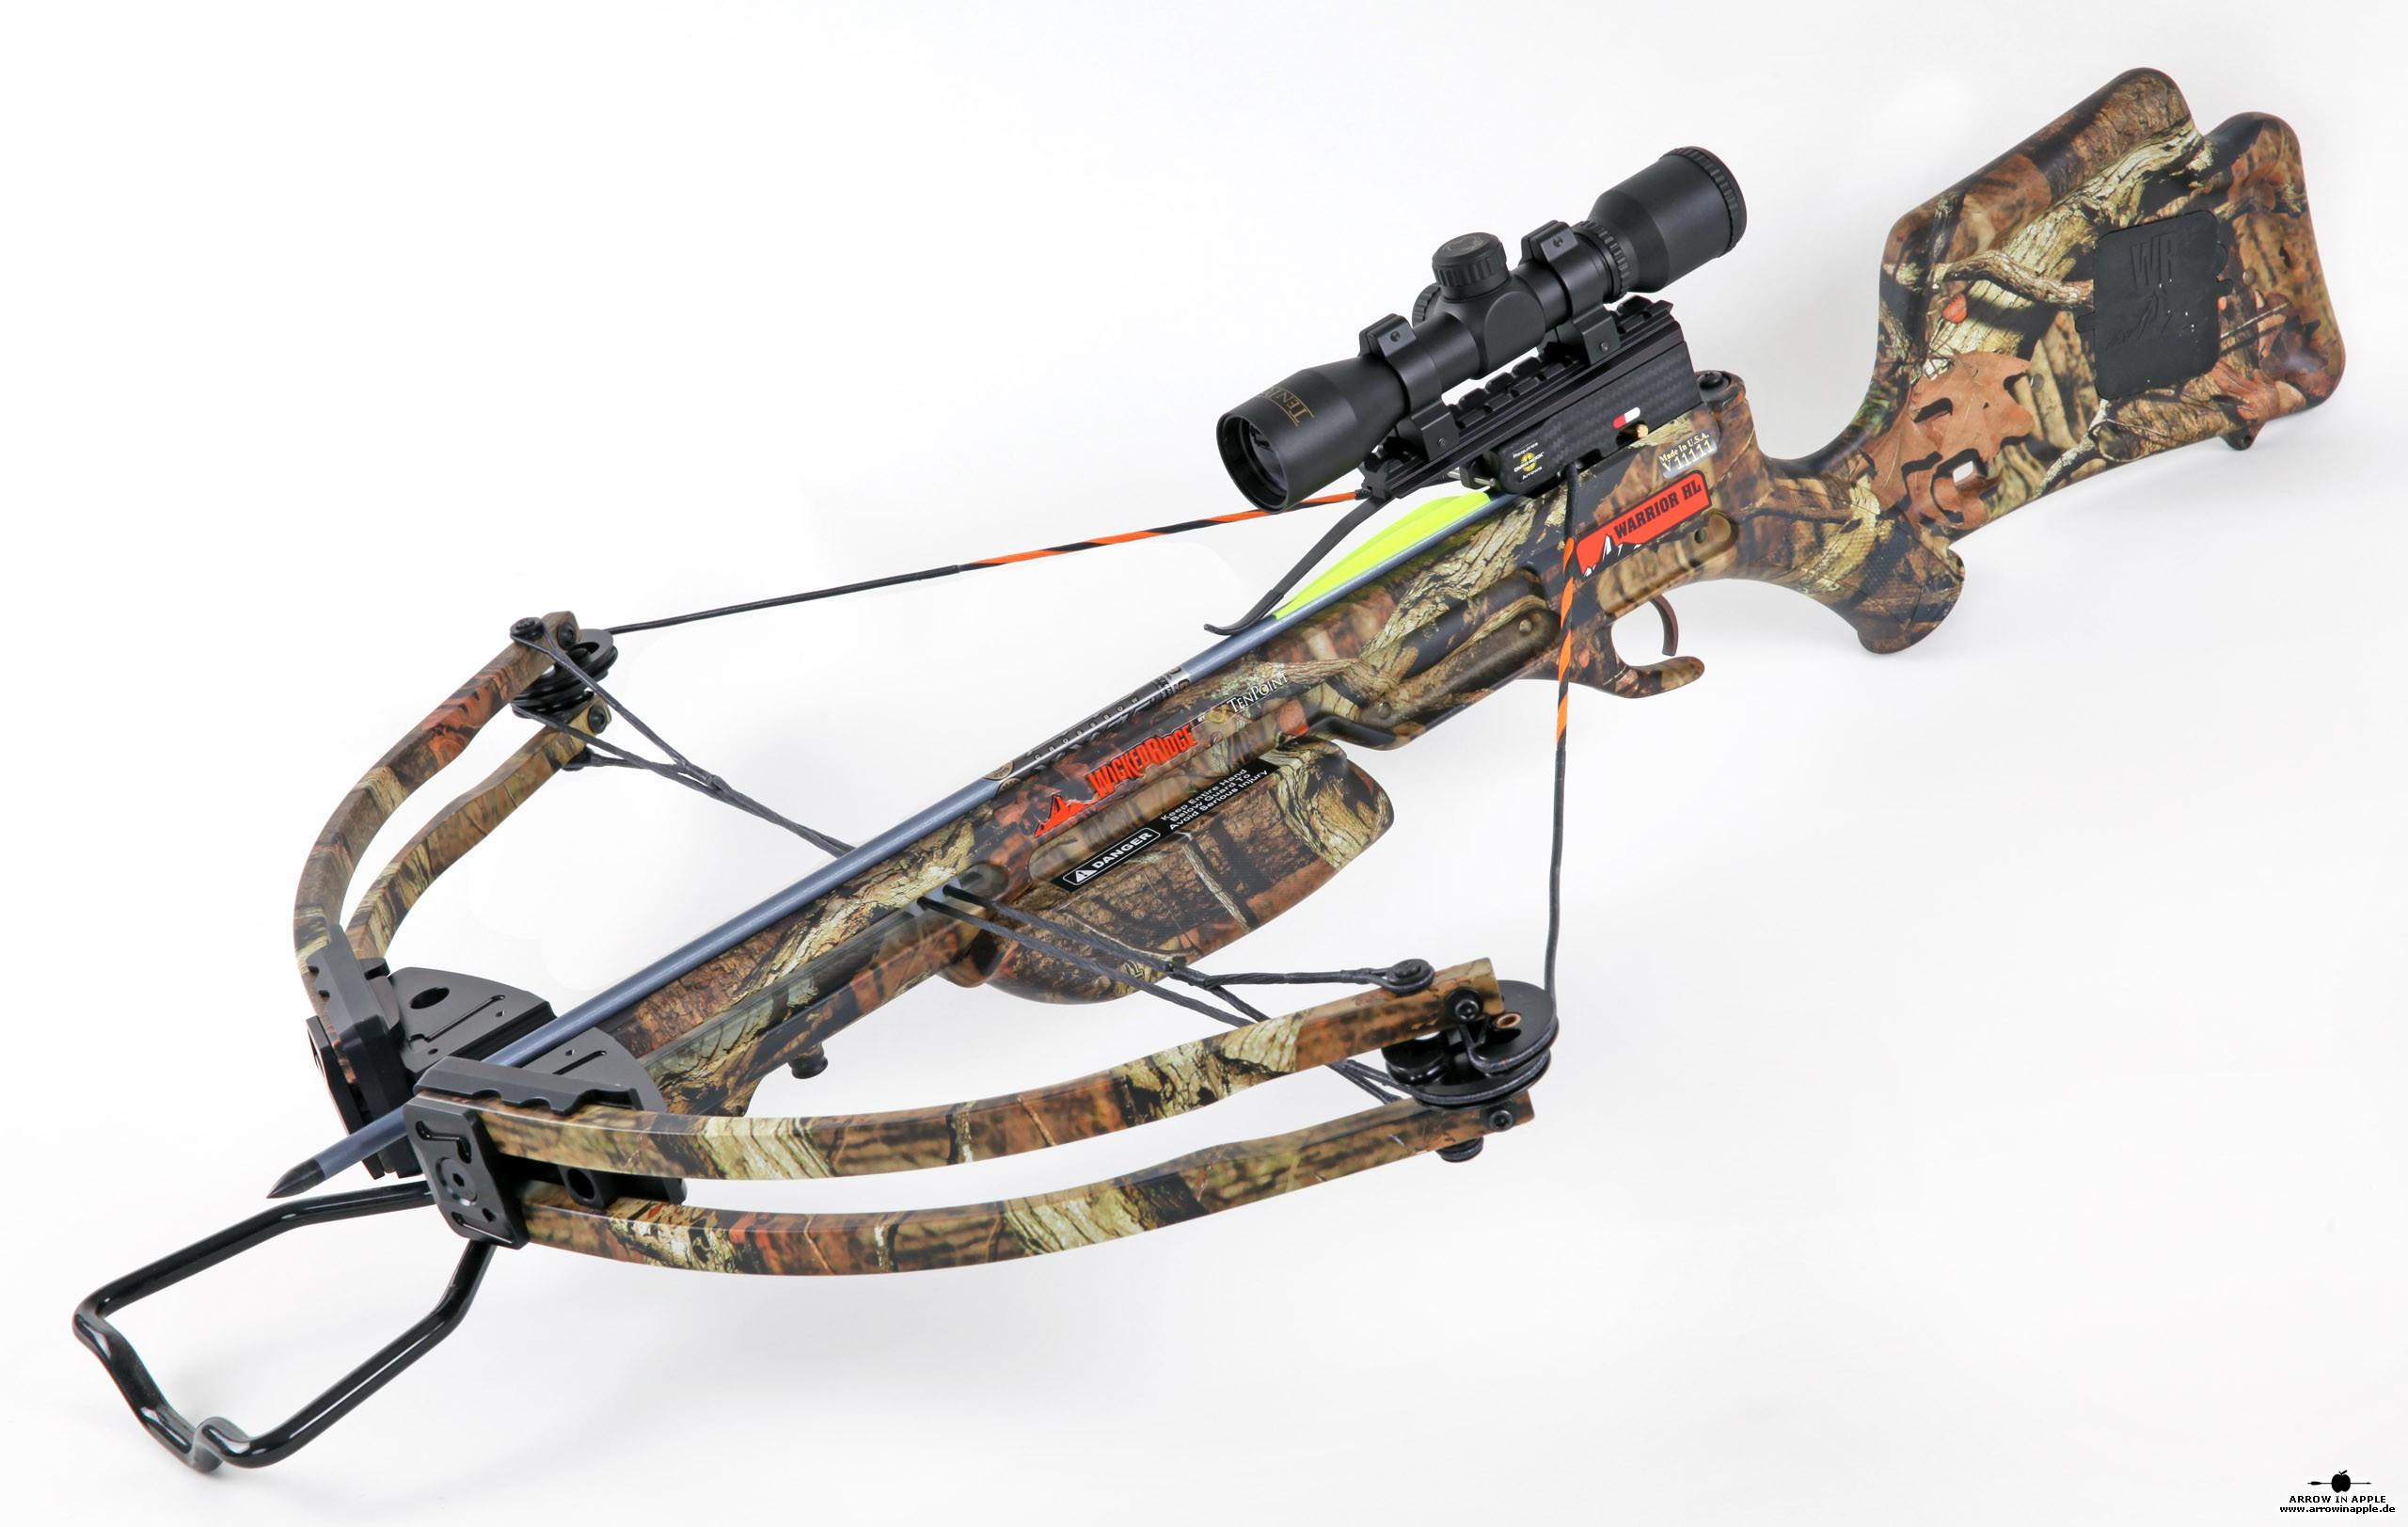 Wicked Ridge Warrior Hl 2015 Crossbow At Arrow In Apple